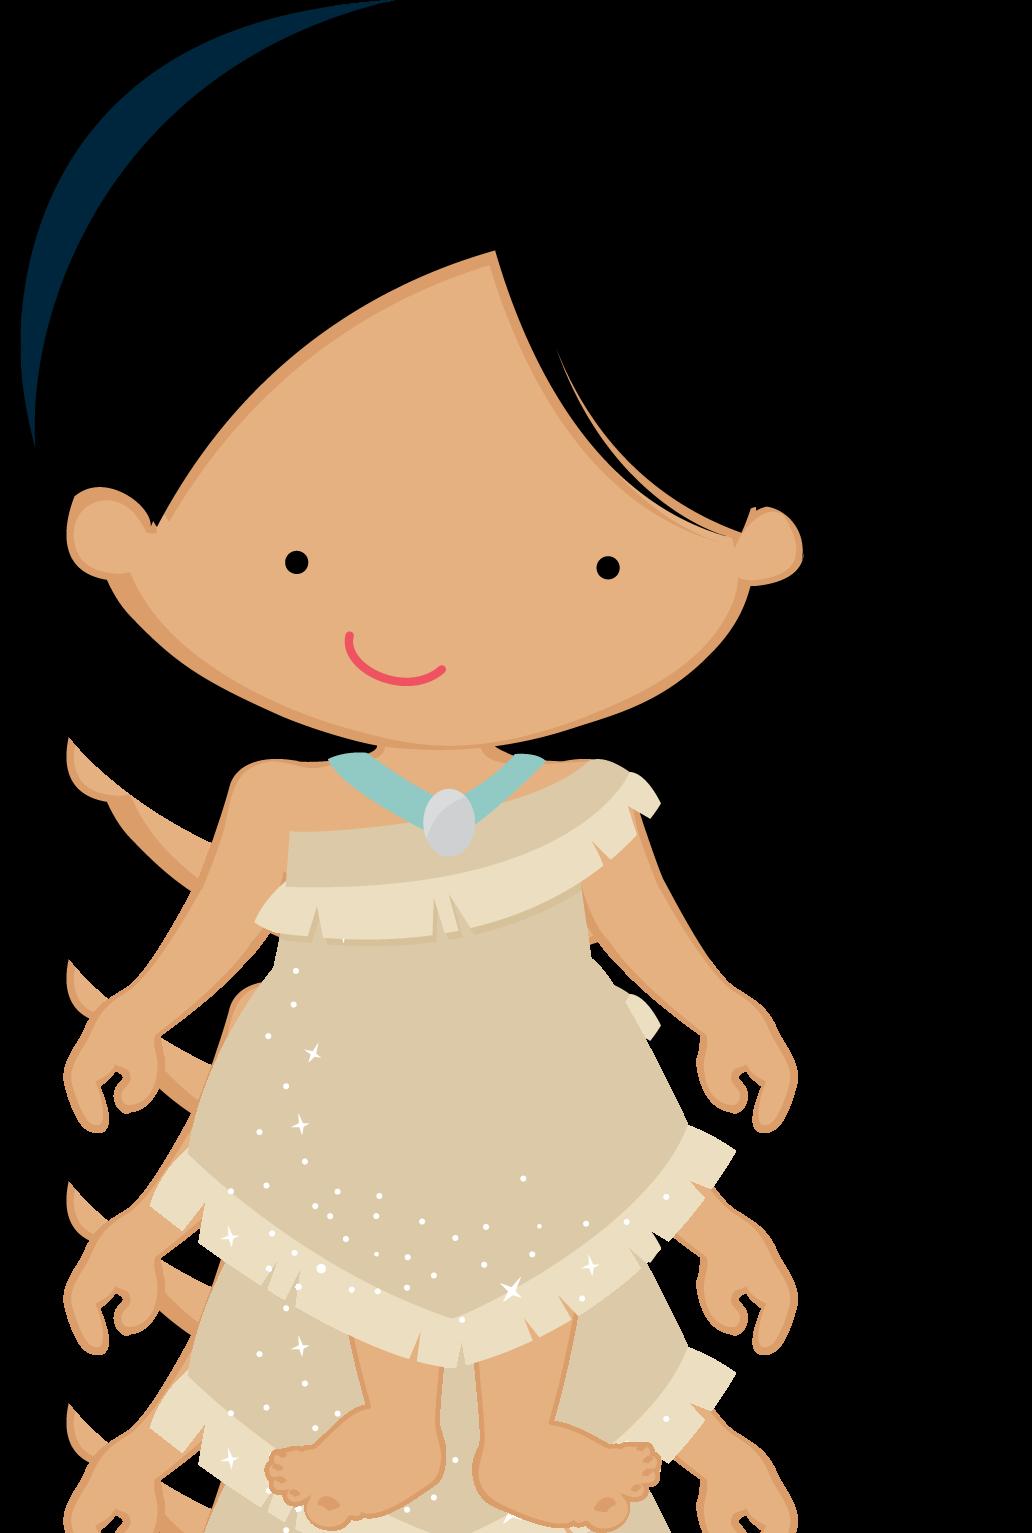 Kawaii house clipart graphic freeuse download Pocahontas | Princesas Disney | Pinterest | Princess disney ... graphic freeuse download